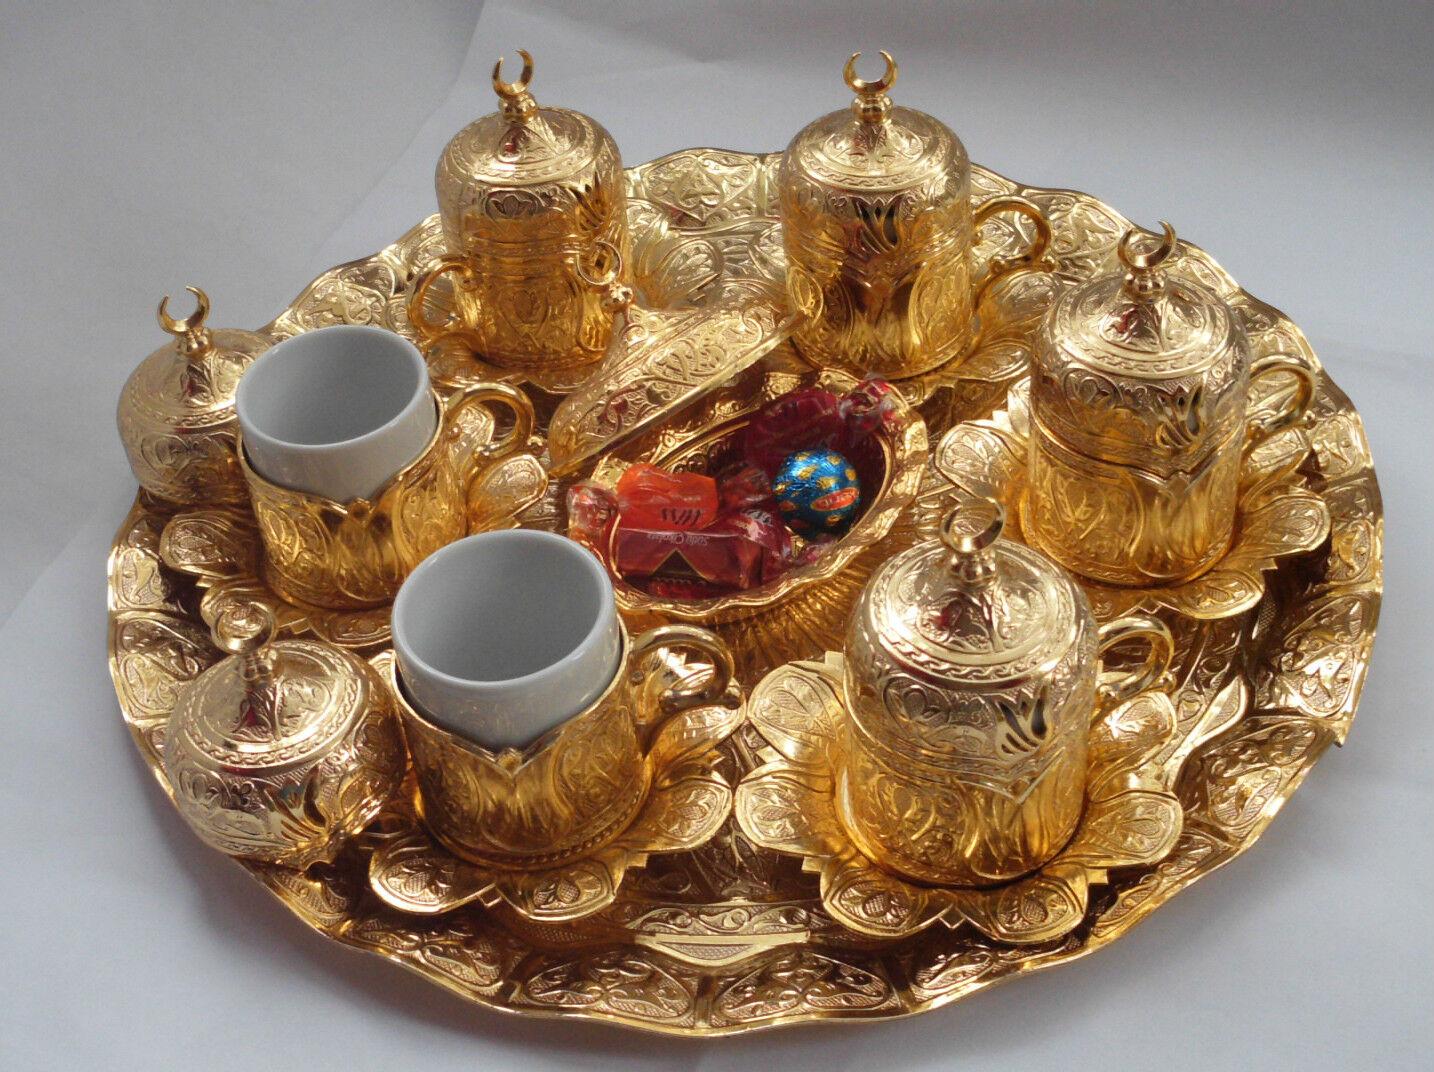 Caffè turco Set Tazze Delight BOWL PORCELLANA VASSOIO Ottomano oro Tulipano giardino